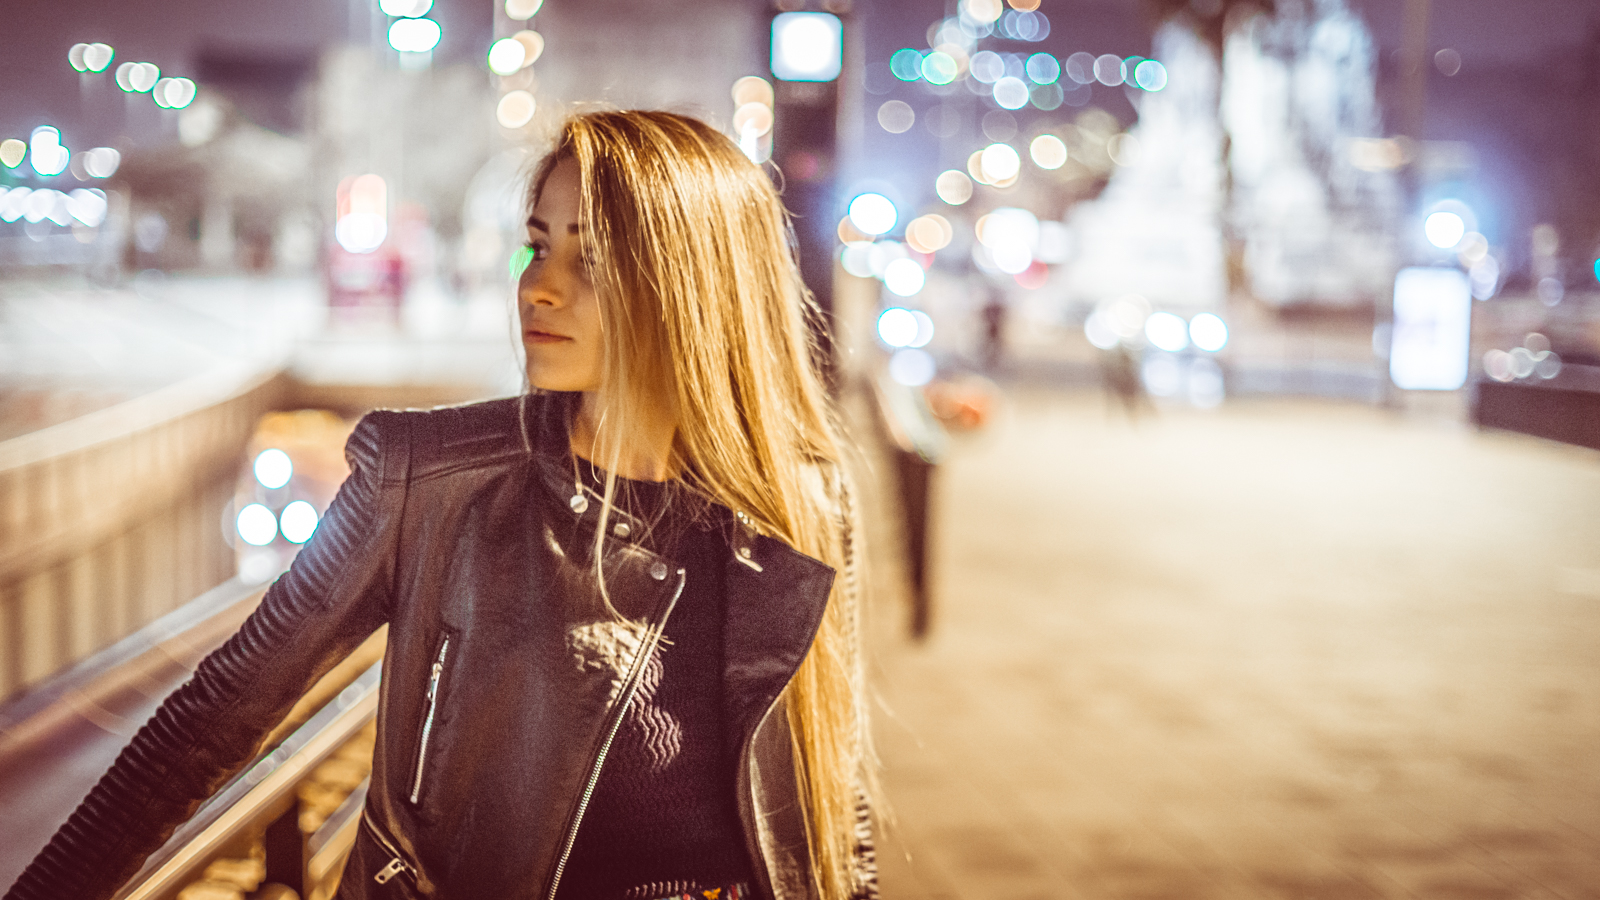 Portraits – The Photo Shoot with Valeria